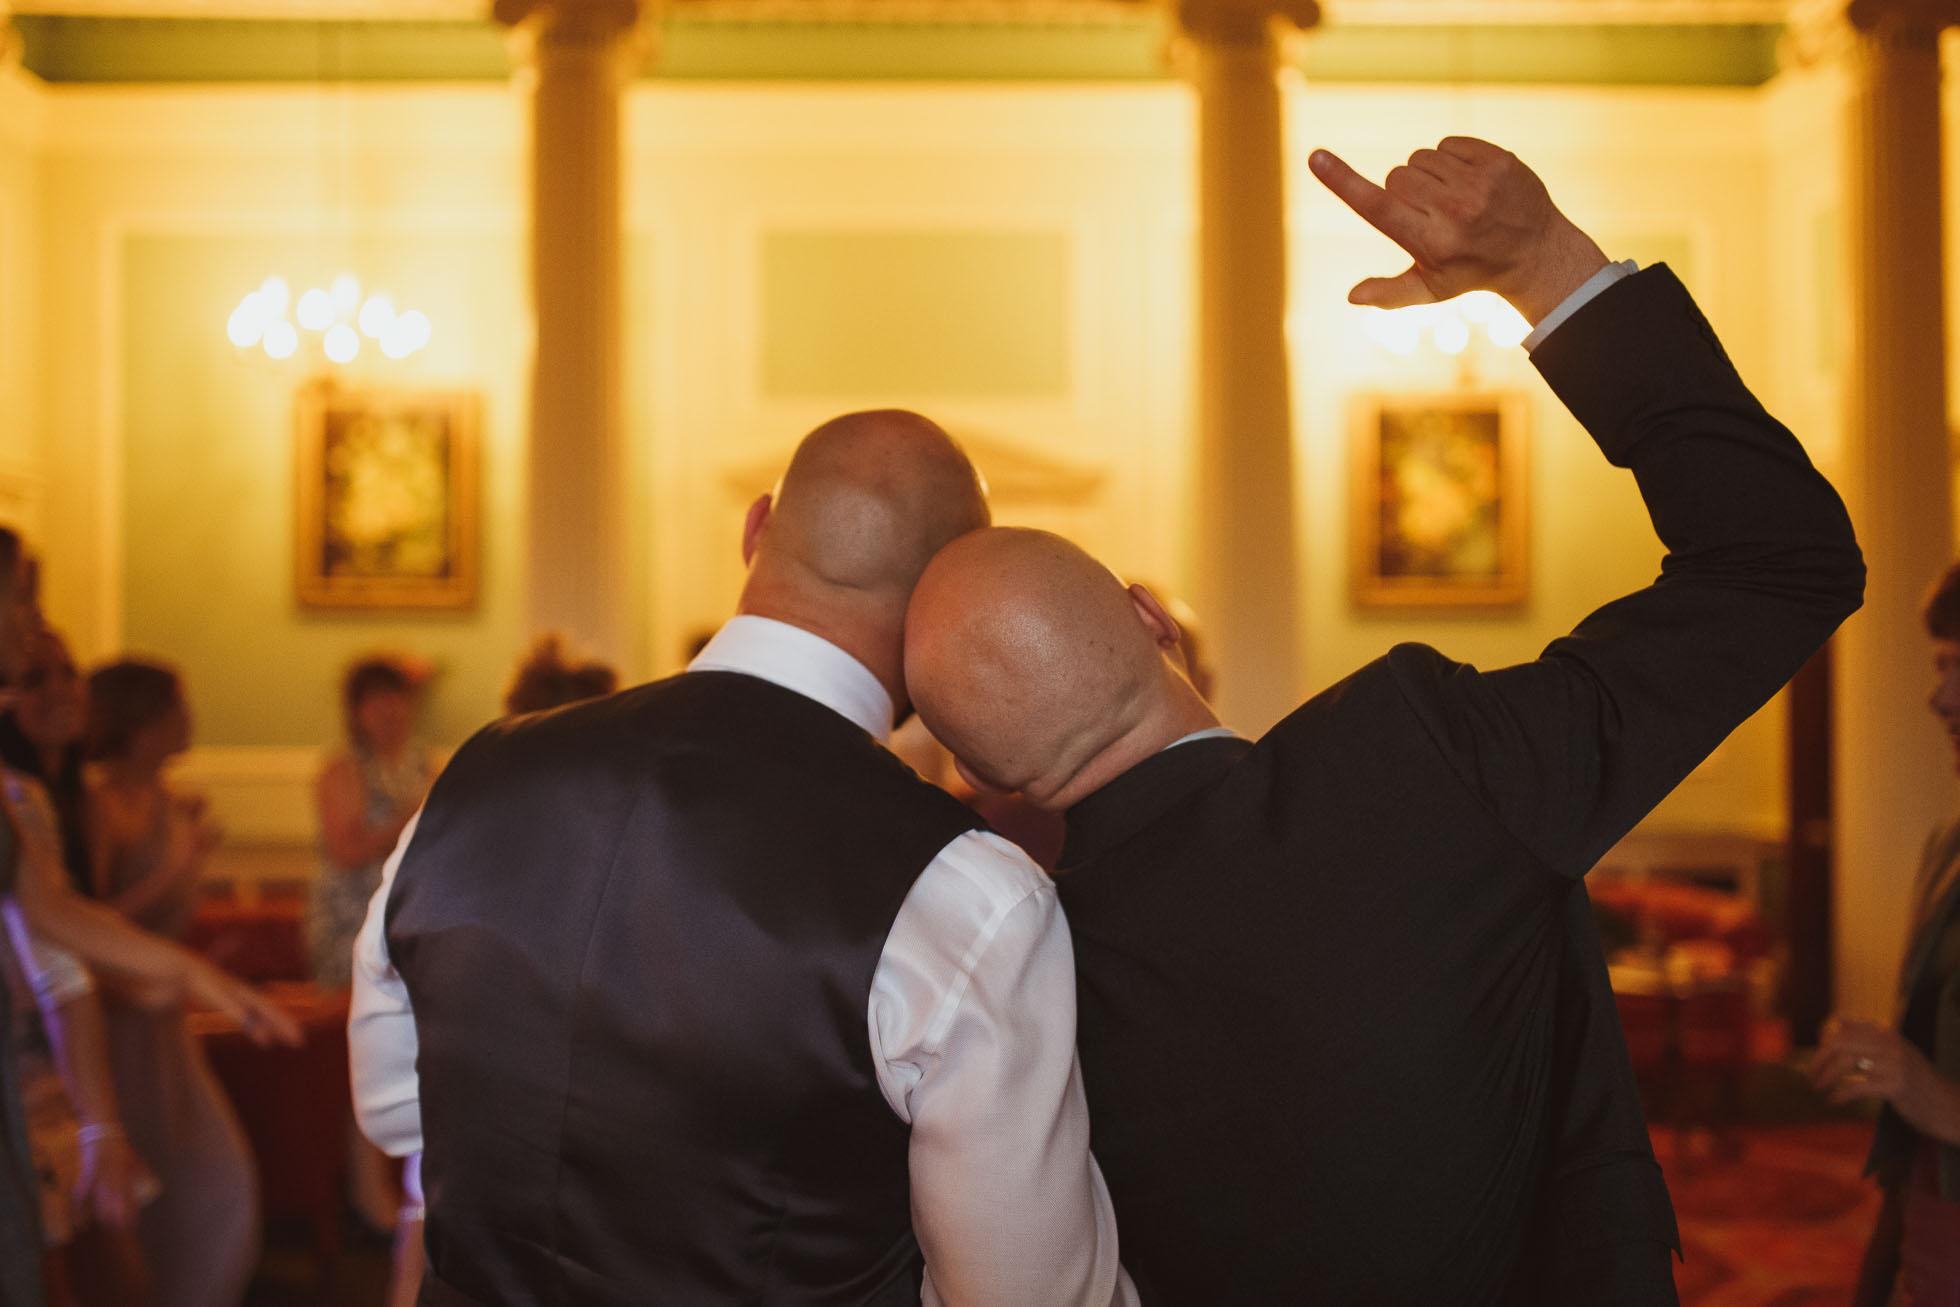 denton-hall-wedding-photographer-72.jpg